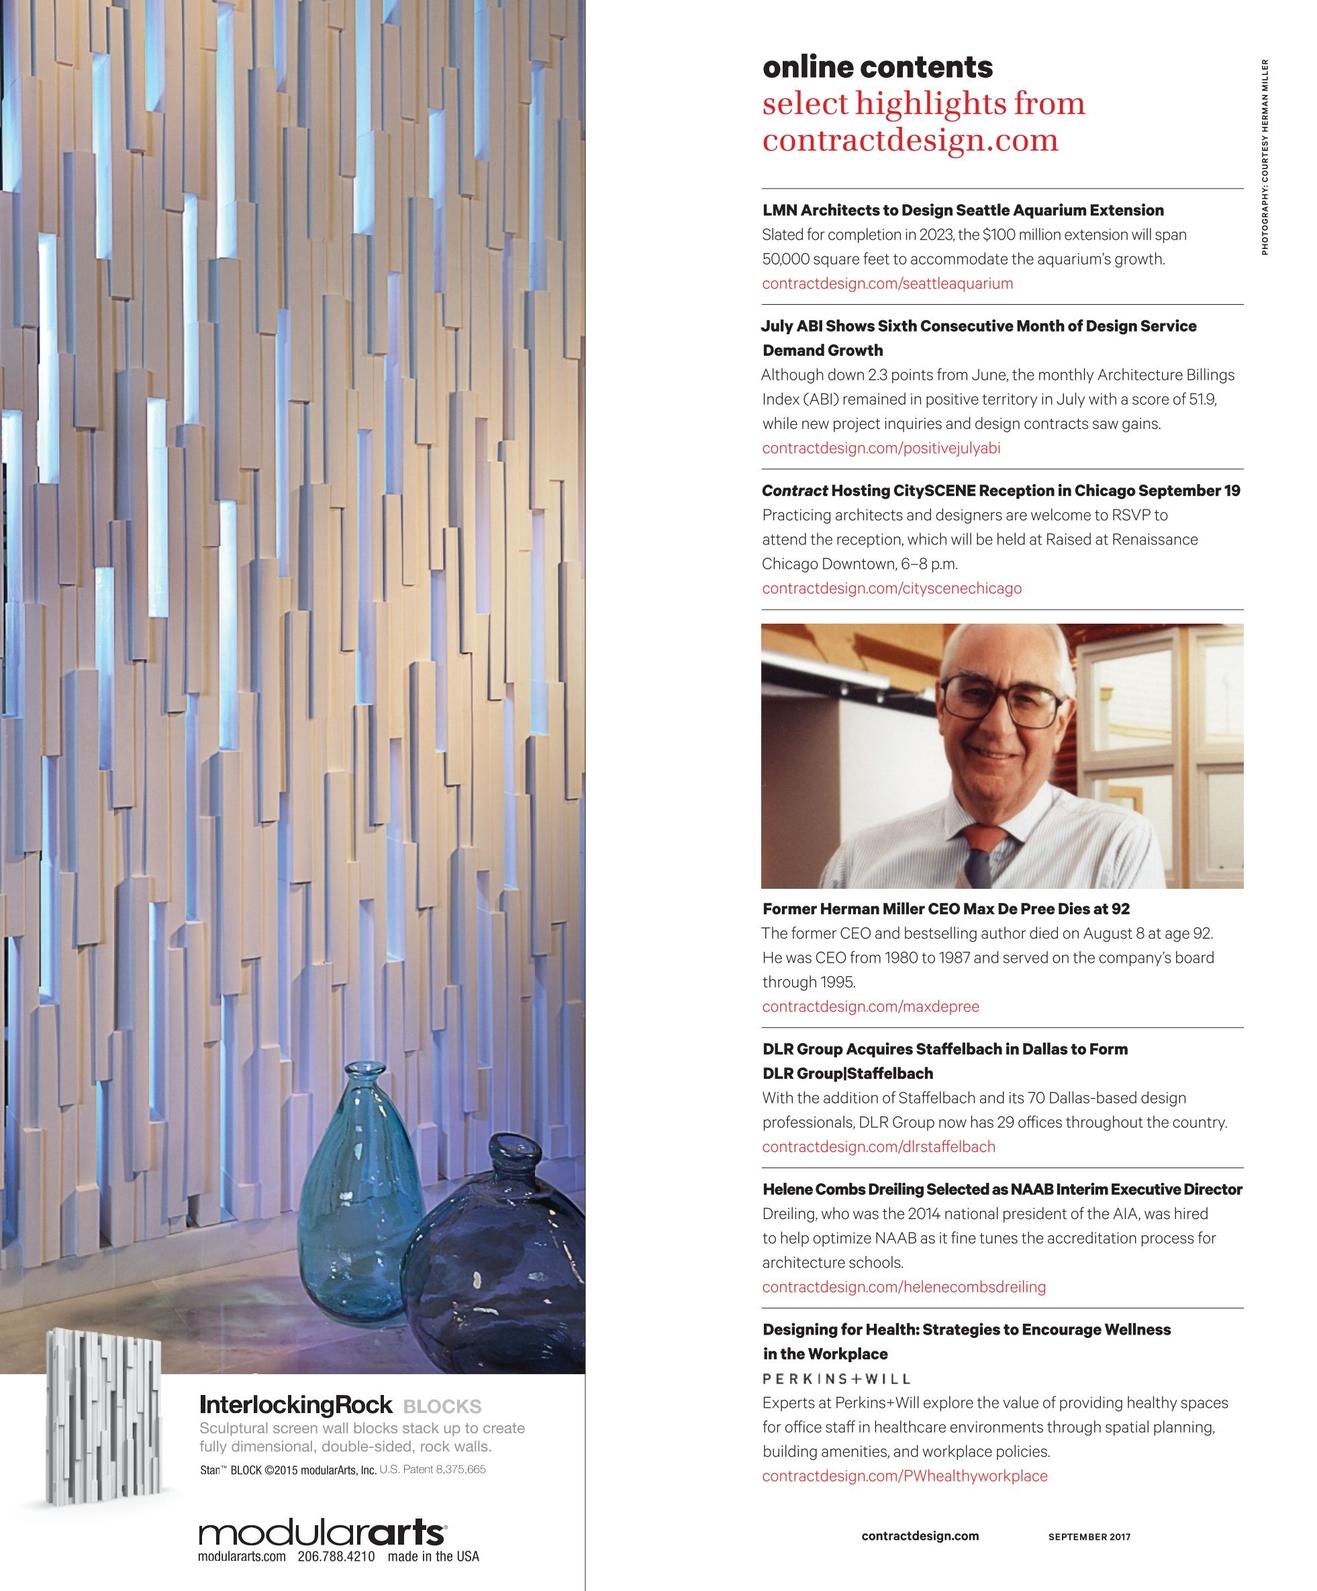 Contract Magazine - September 2017